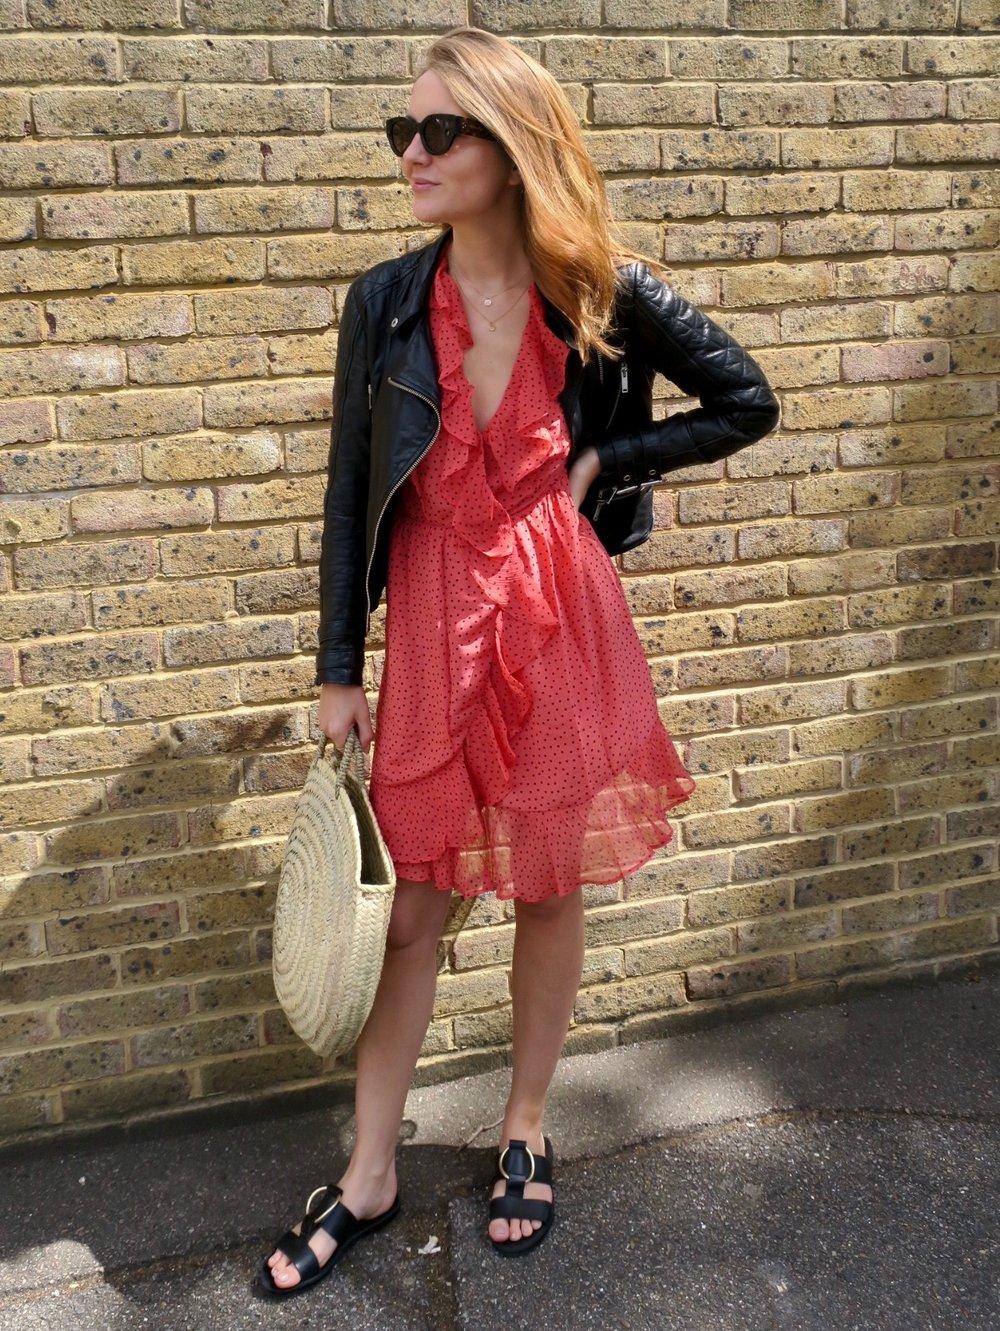 THE GROWN UP EDIT - Red Polka Dot Dress